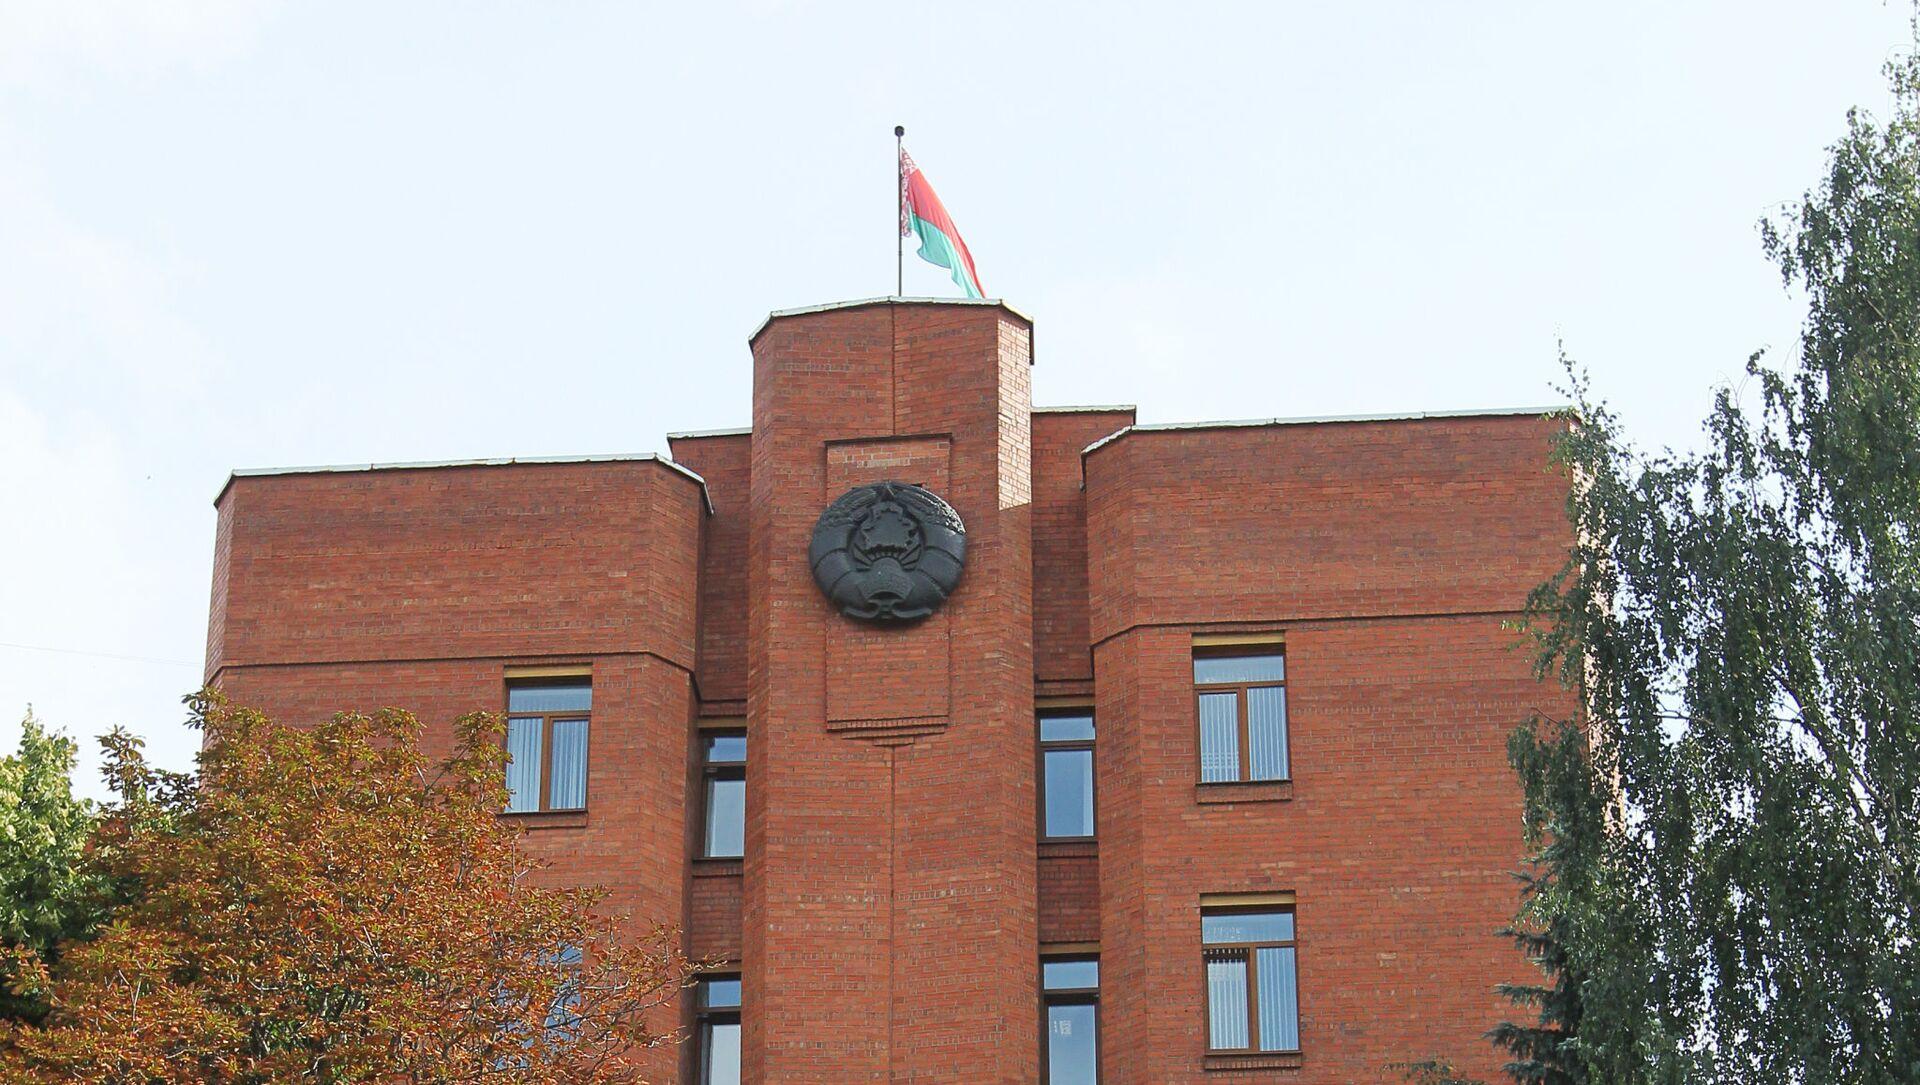 Gmach Prokuratury Generalnej Białorusi.  - Sputnik Polska, 1920, 09.04.2021